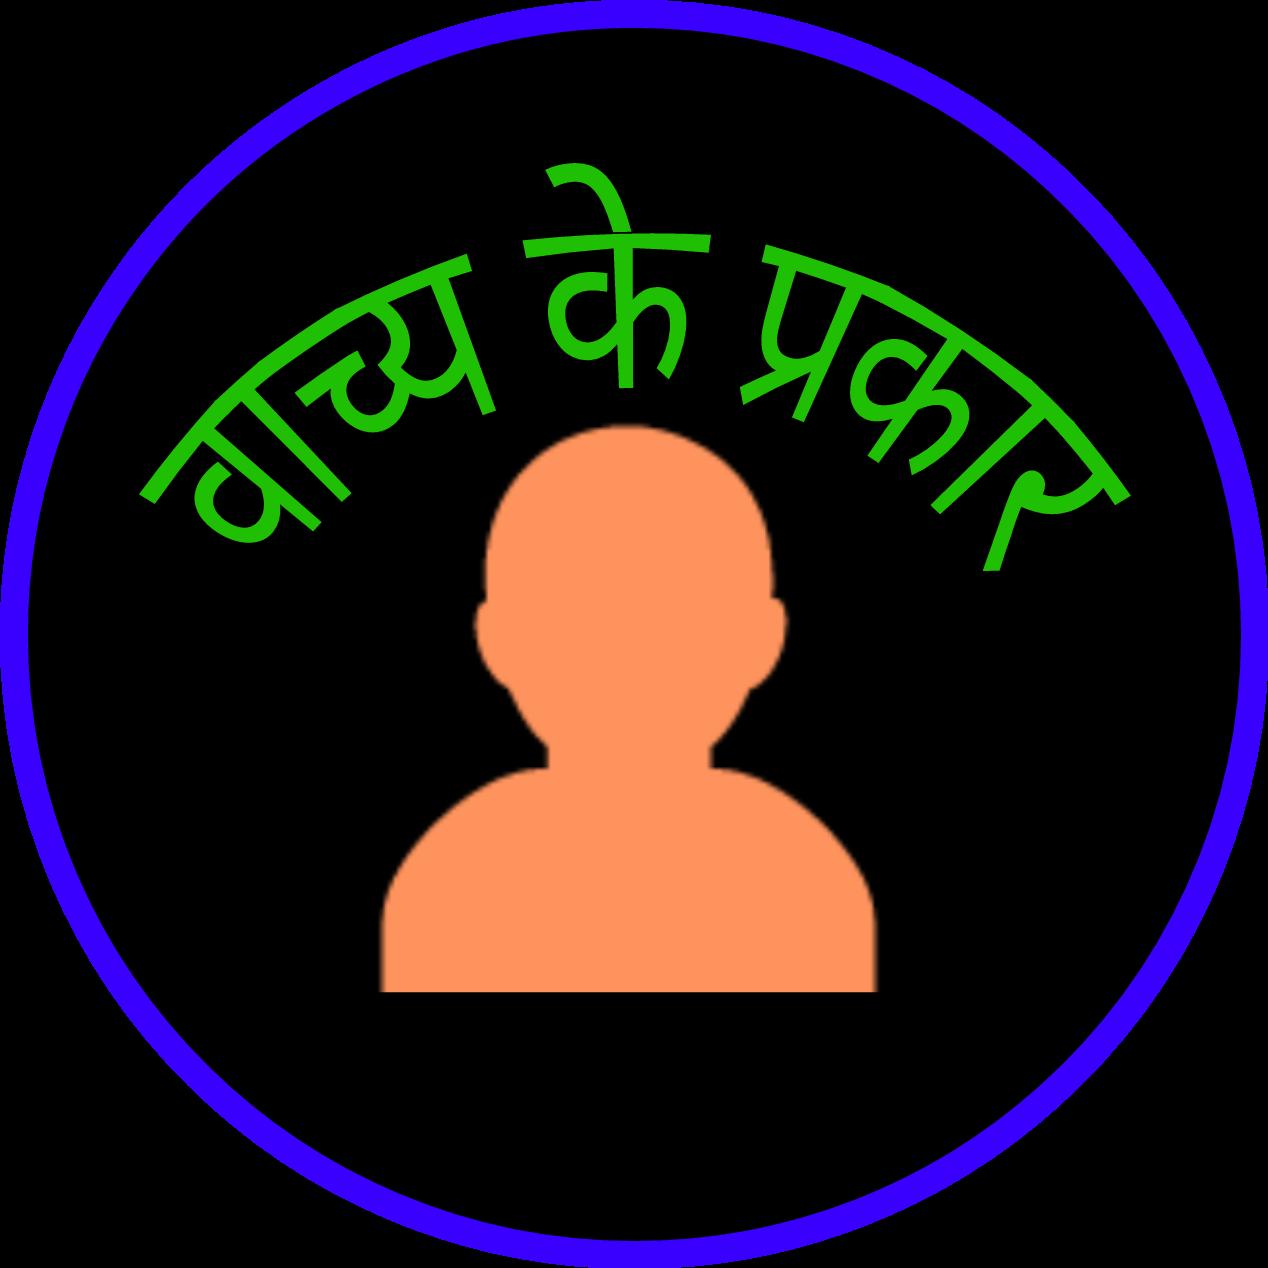 Grammar clipart hindi grammar. Vachya aur ke bhed